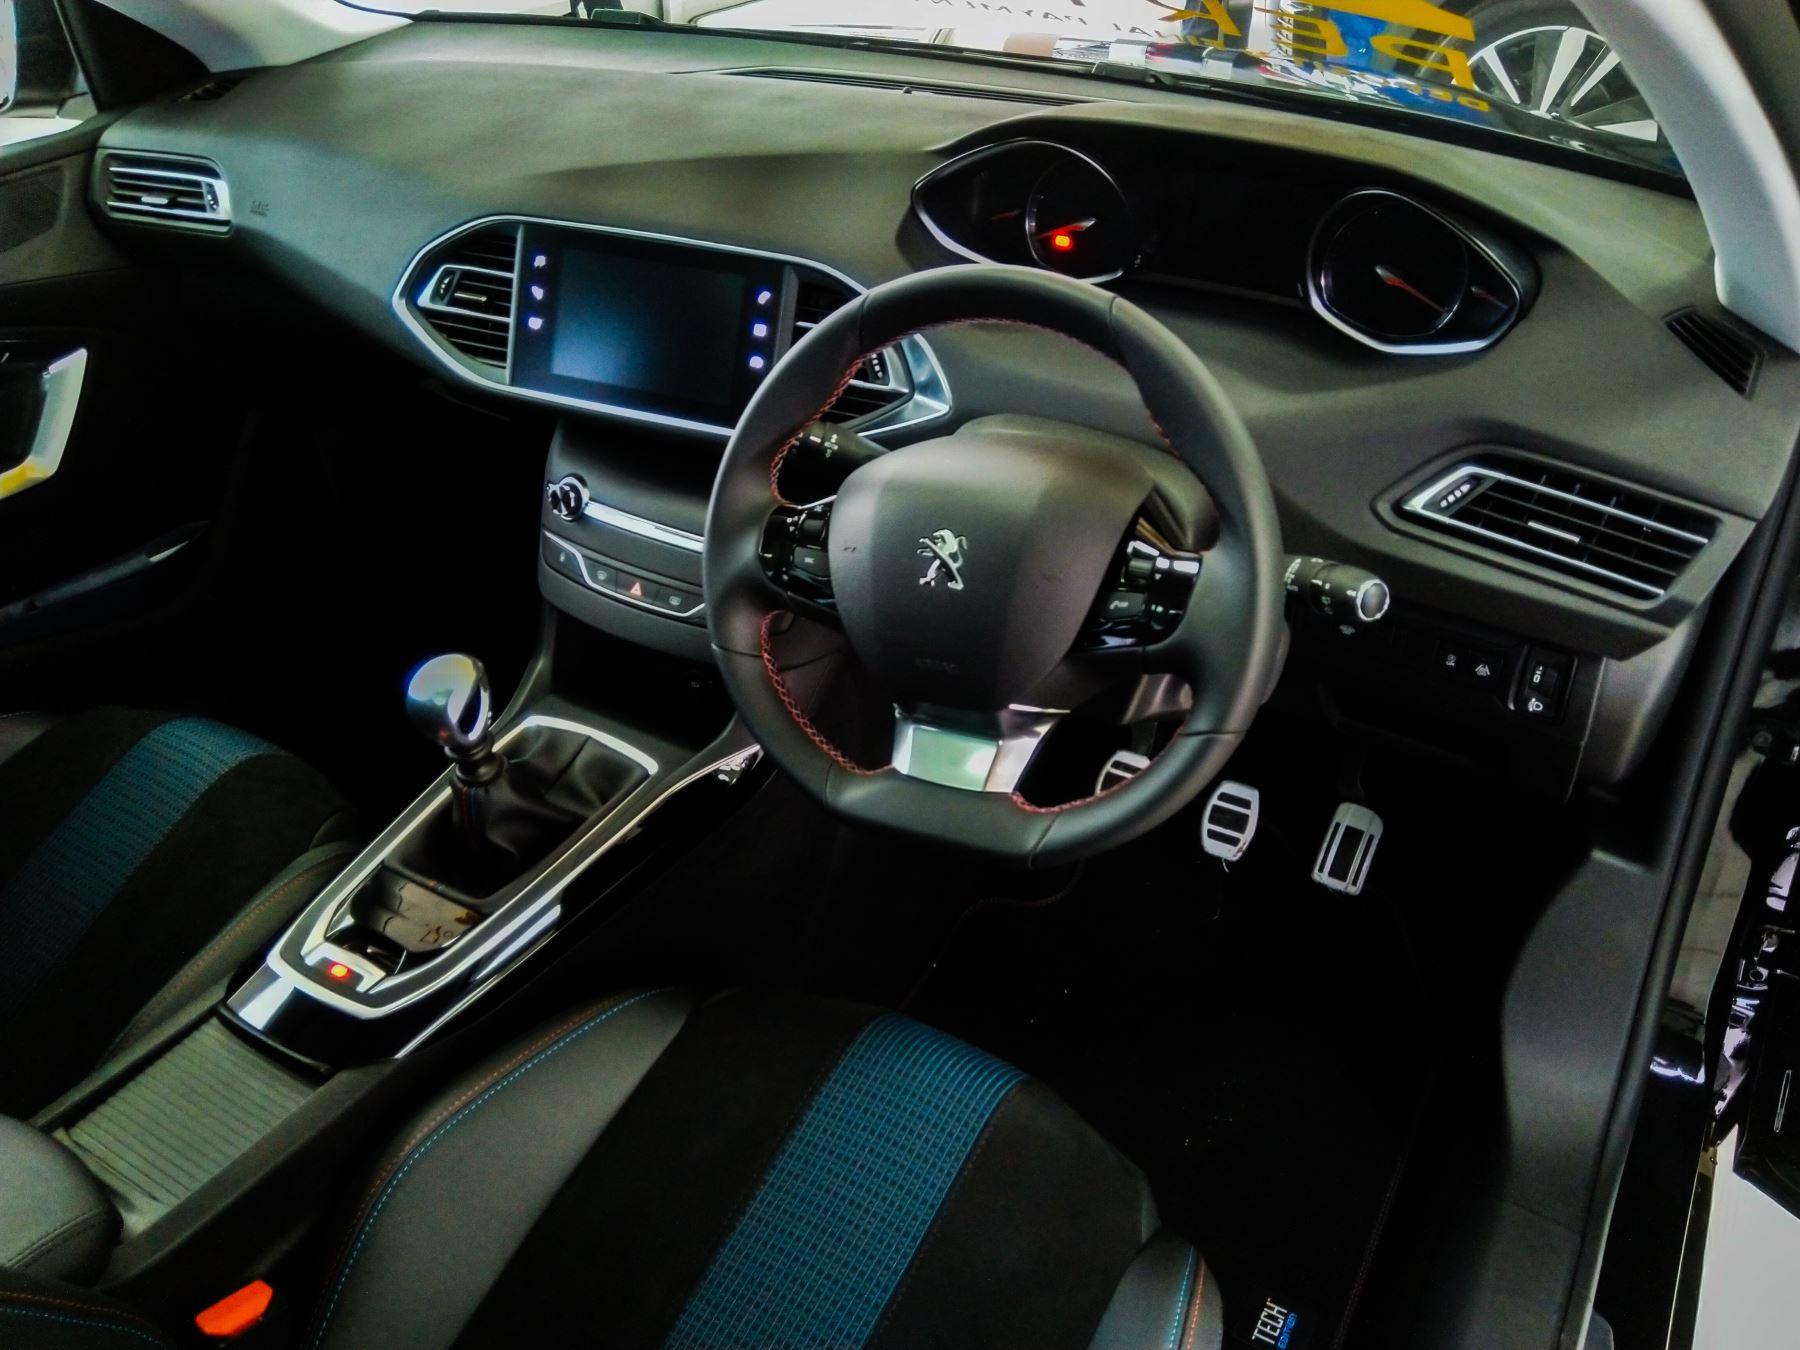 Peugeot 308 1.5 BlueHDi 130 Tech Edition image 8